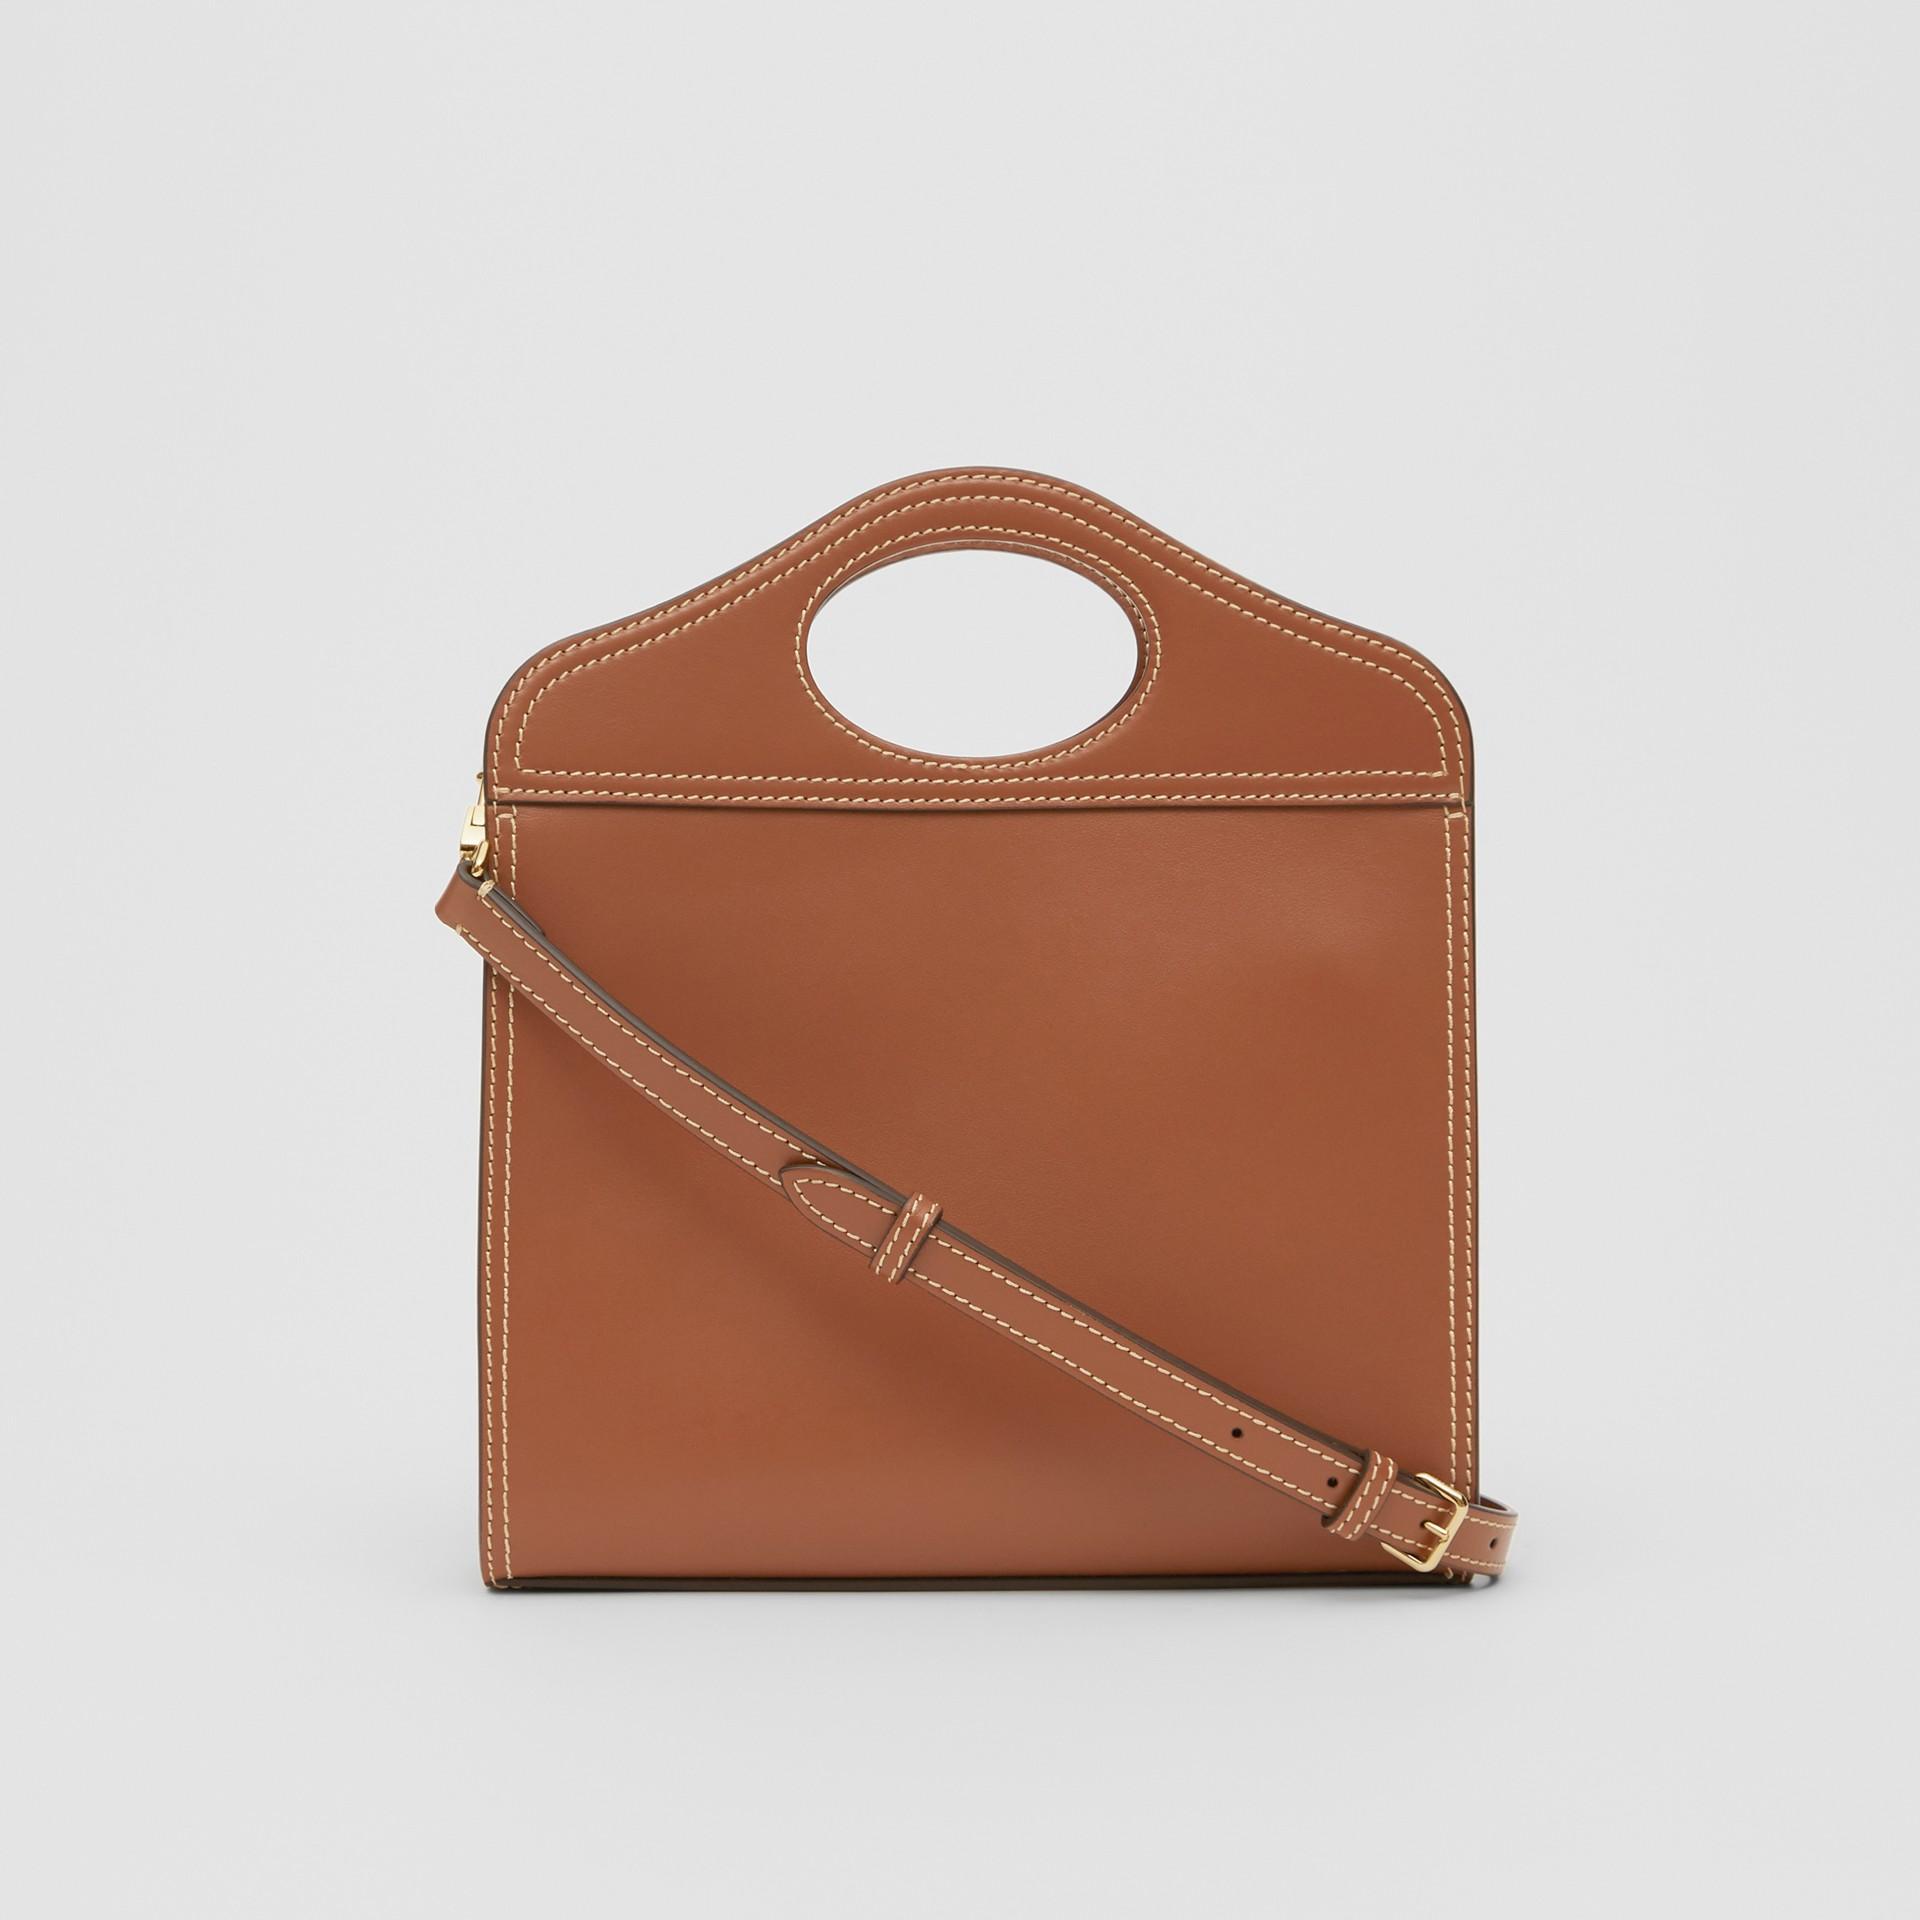 Mini Topstitch Detail Leather Pocket Bag in Malt Brown - Women | Burberry United Kingdom - gallery image 6